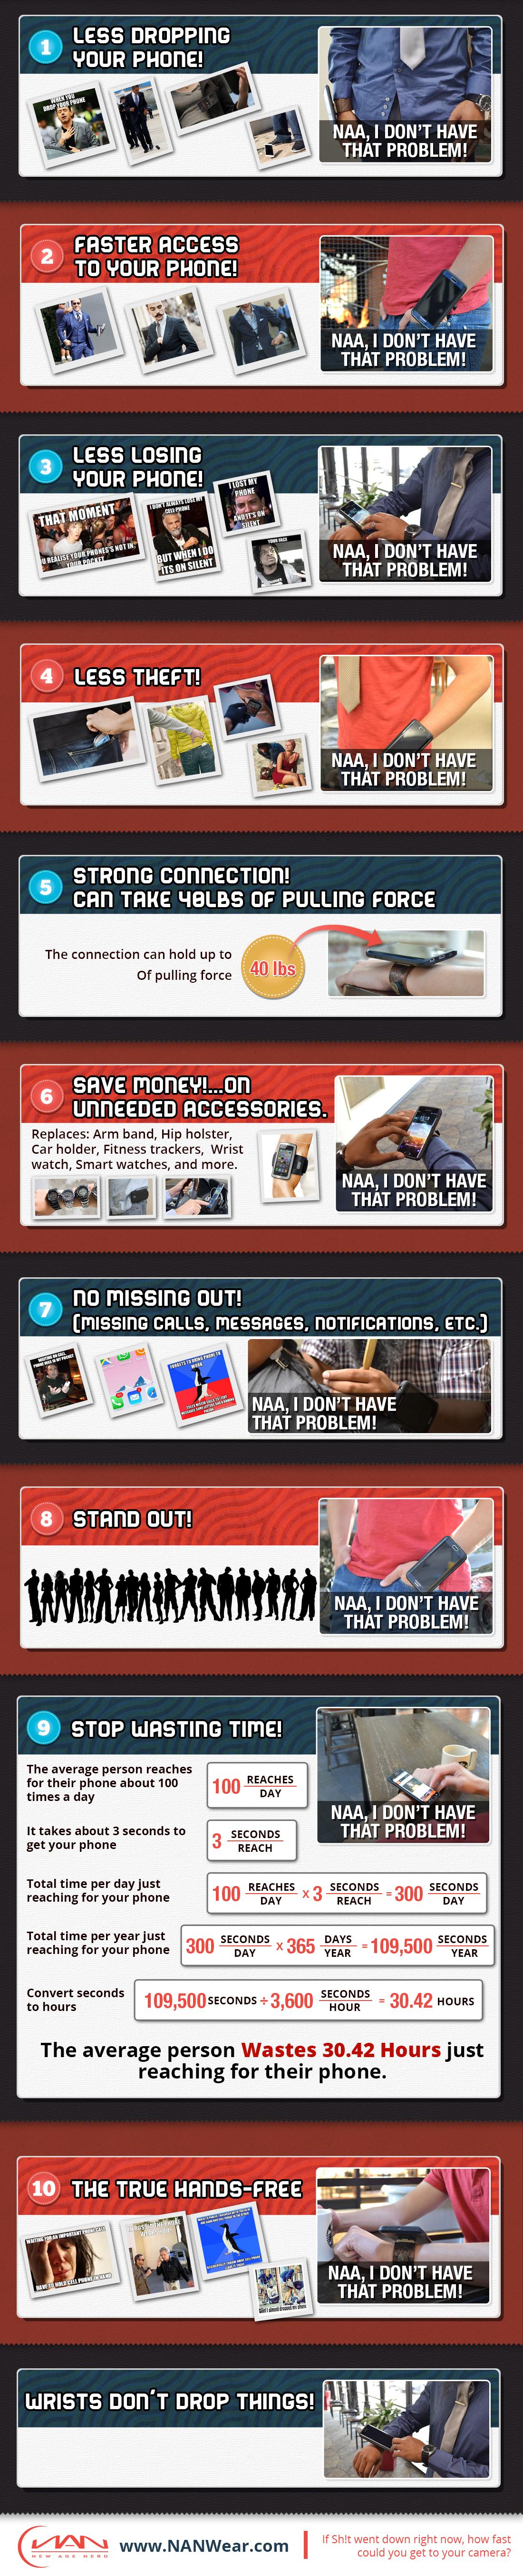 WristMC Life Hacks